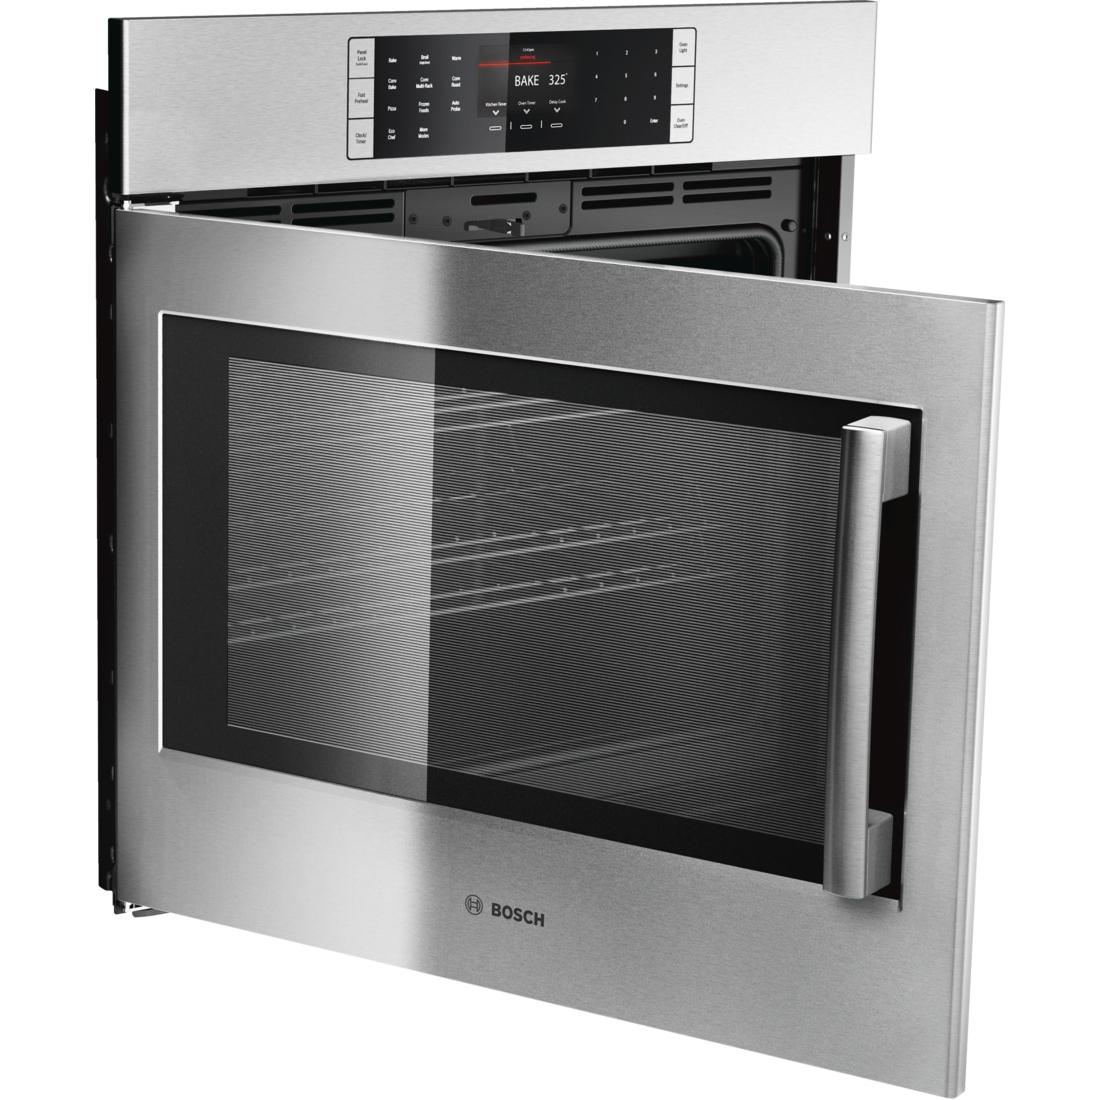 Cabanu_electrodomestico_MCSA00784087_Bosch-Single-Oven-HBLP451LUC-FRONT-Side-Opening-Door-Open_def.jpg